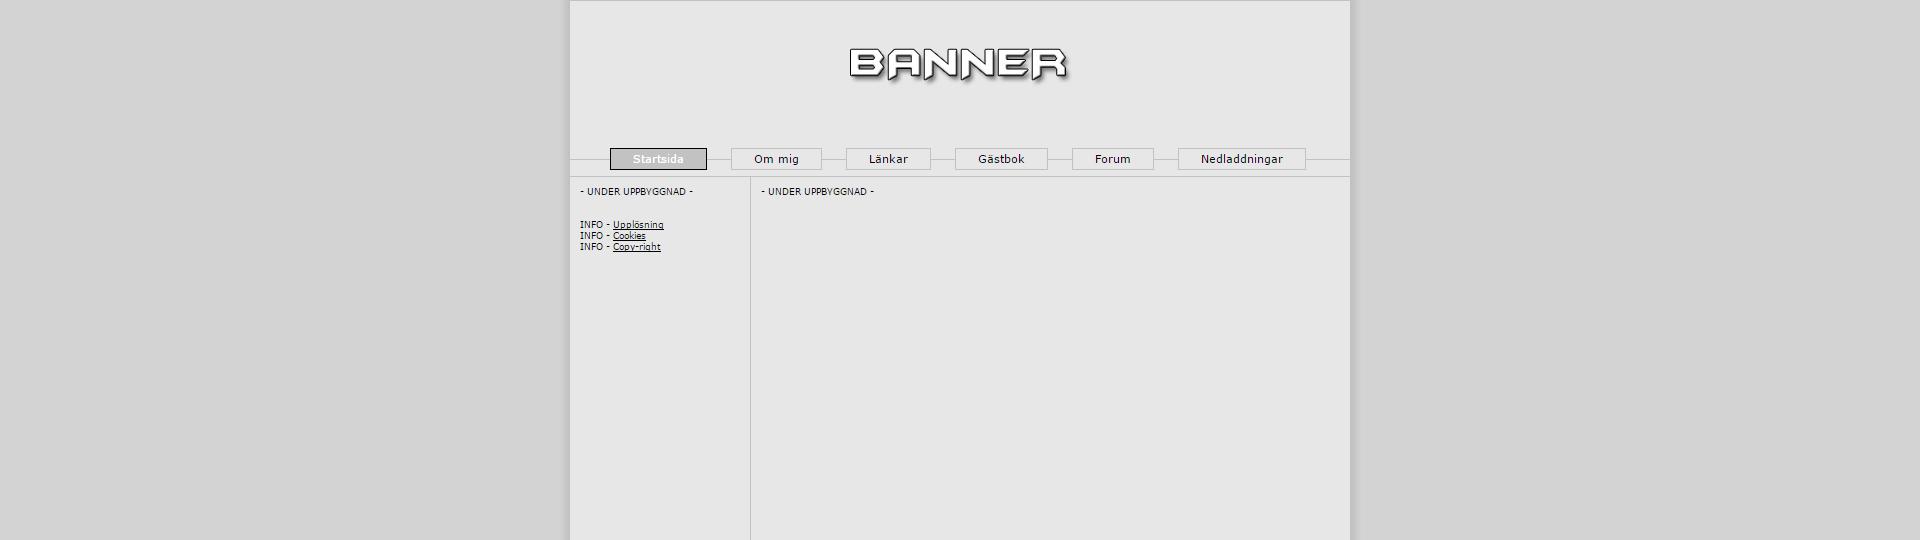 simple-style-v2/assets/images/banner.png